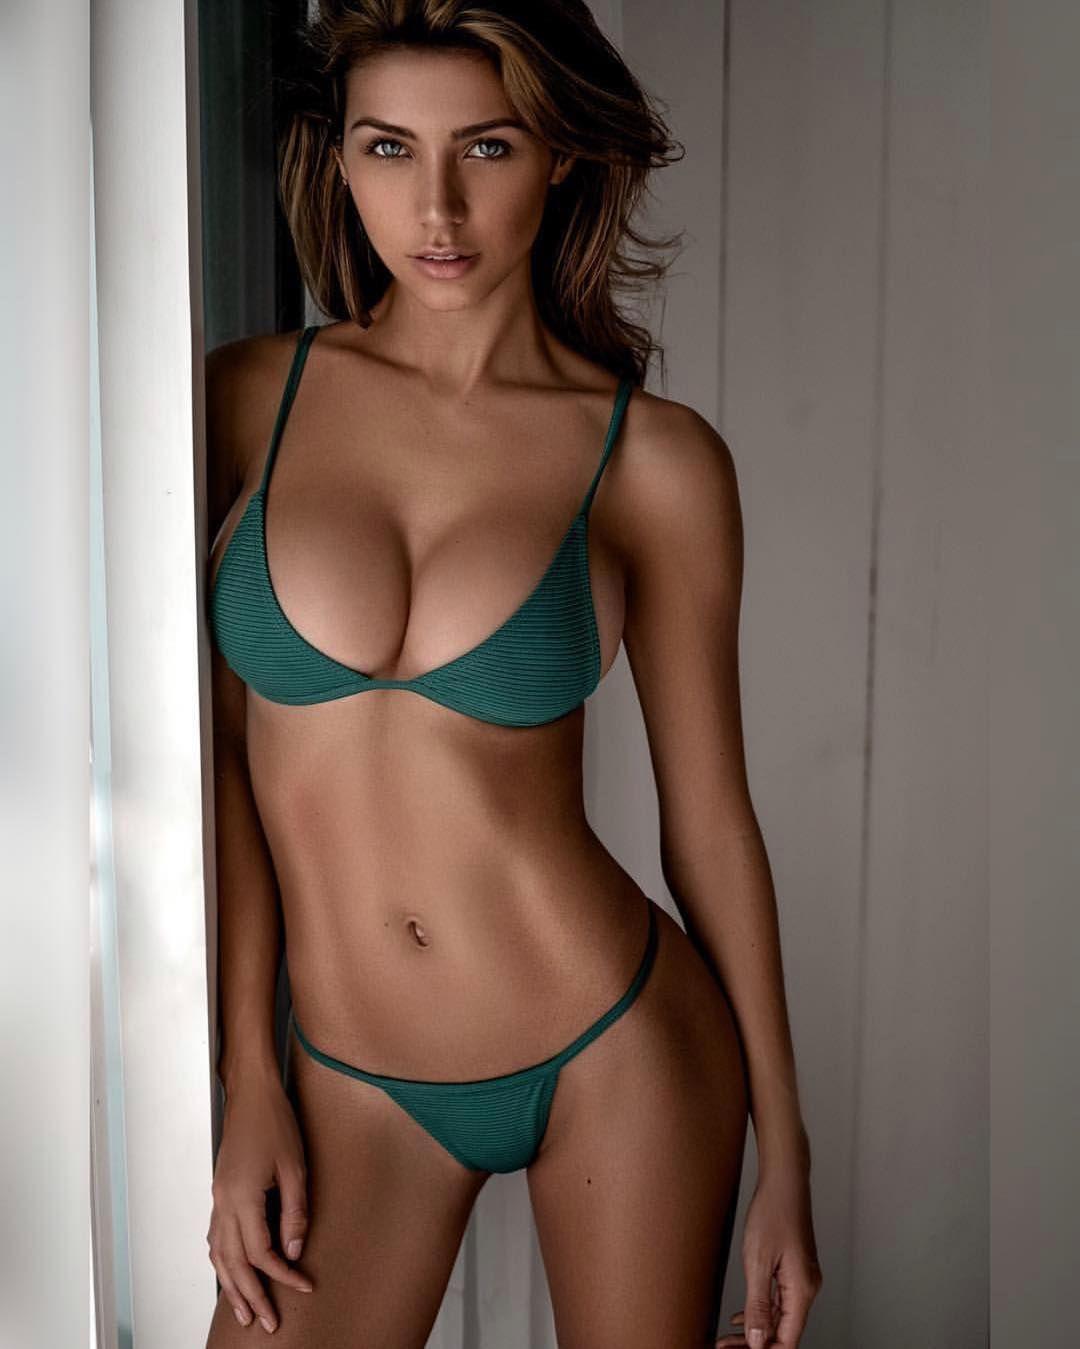 Mtv fast and gorgeous girls in bikini